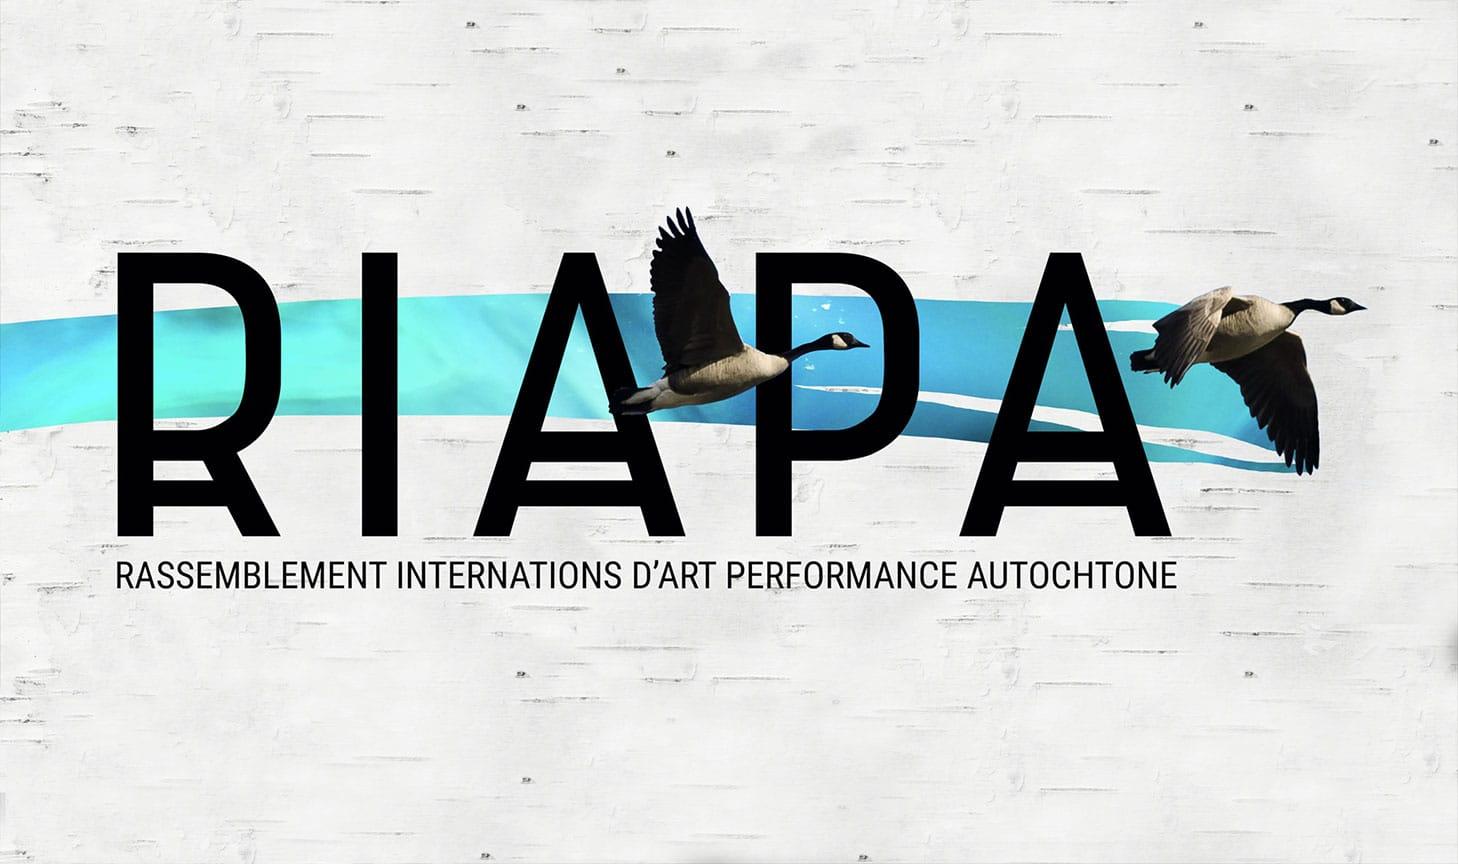 RIAPA, le rassemblement internations d'art performance autochtone